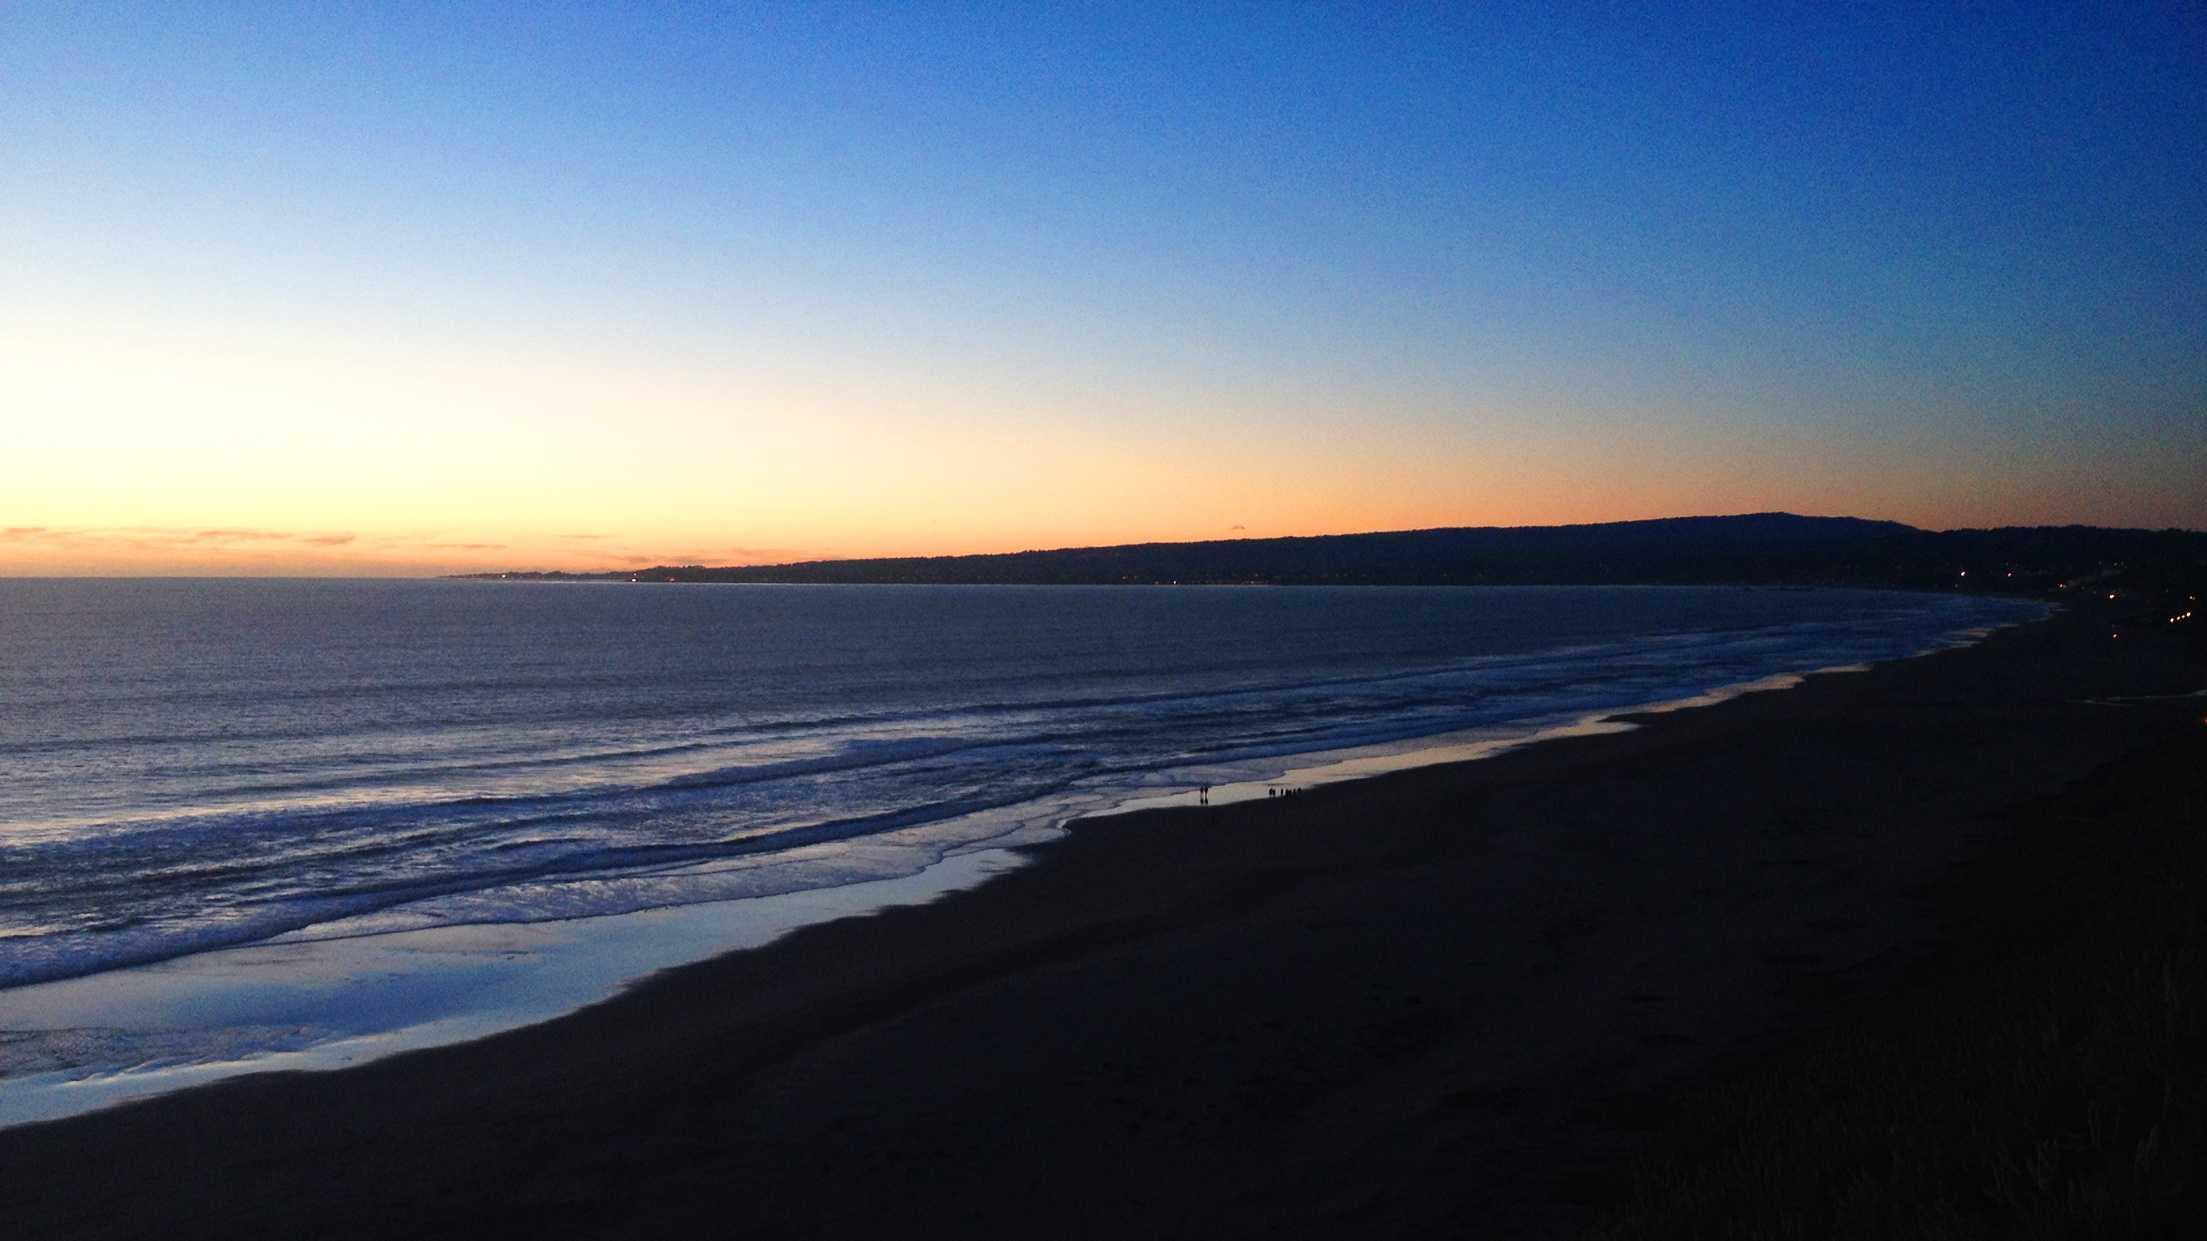 Santa Cruz is seen on the horizon at sunset. Dec. 25, 2014